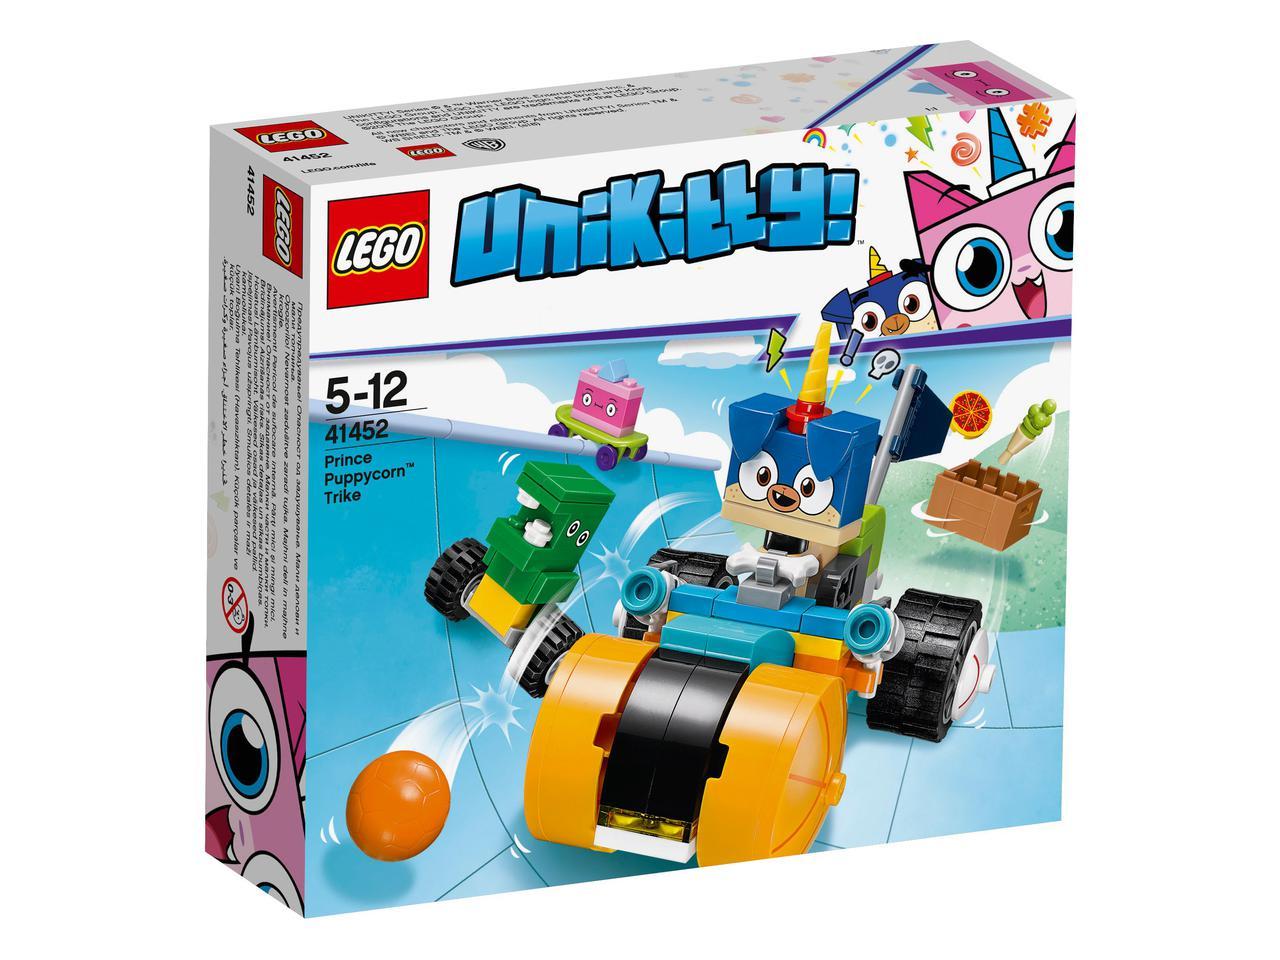 41452 Lego Unikitty Велосипед принца Паппикорна, Лего Юникитти